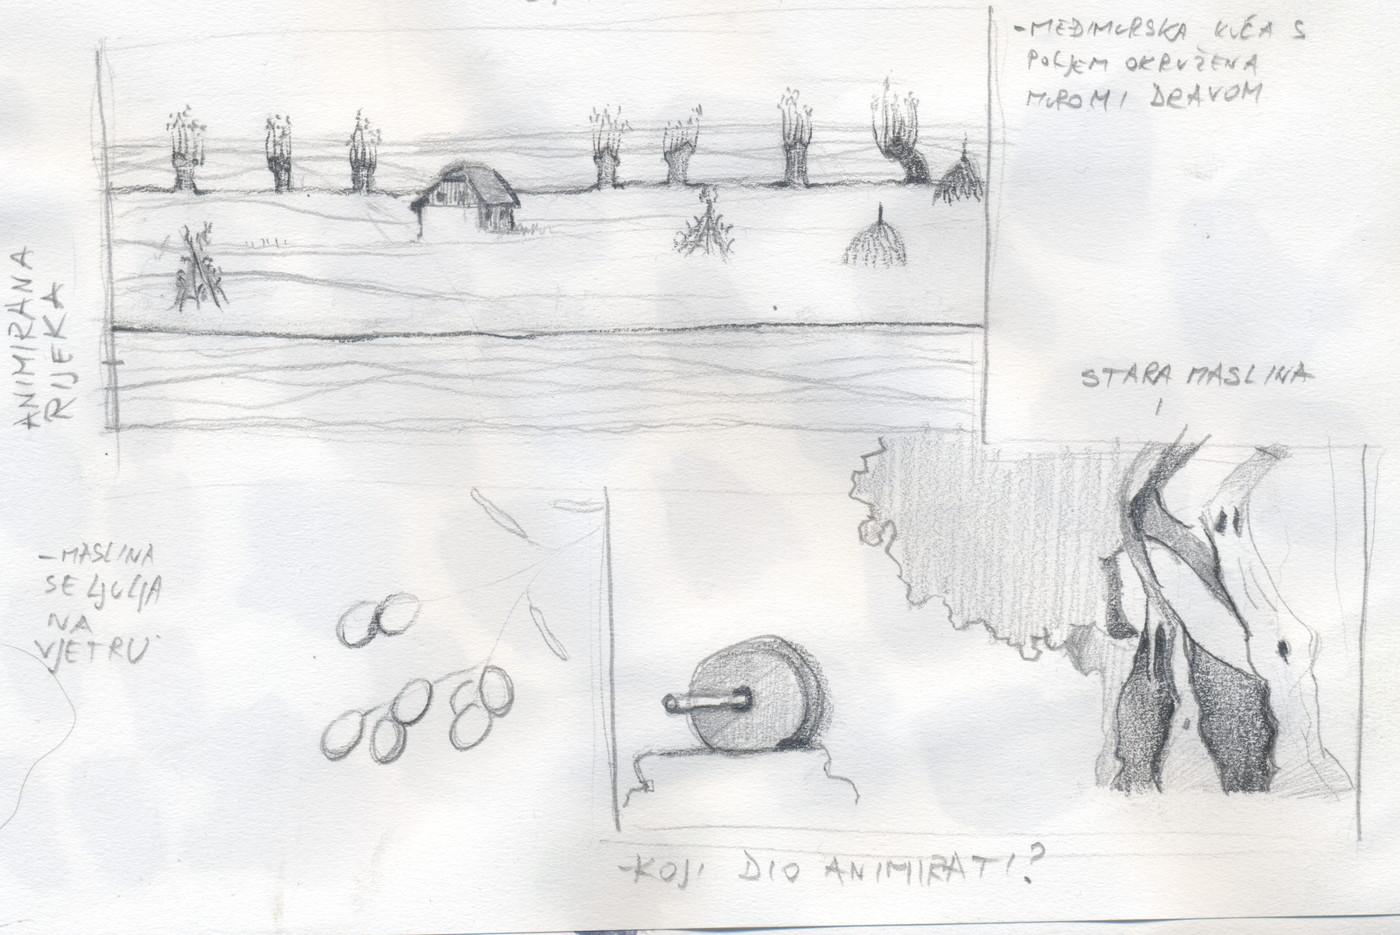 lado sketch olive island